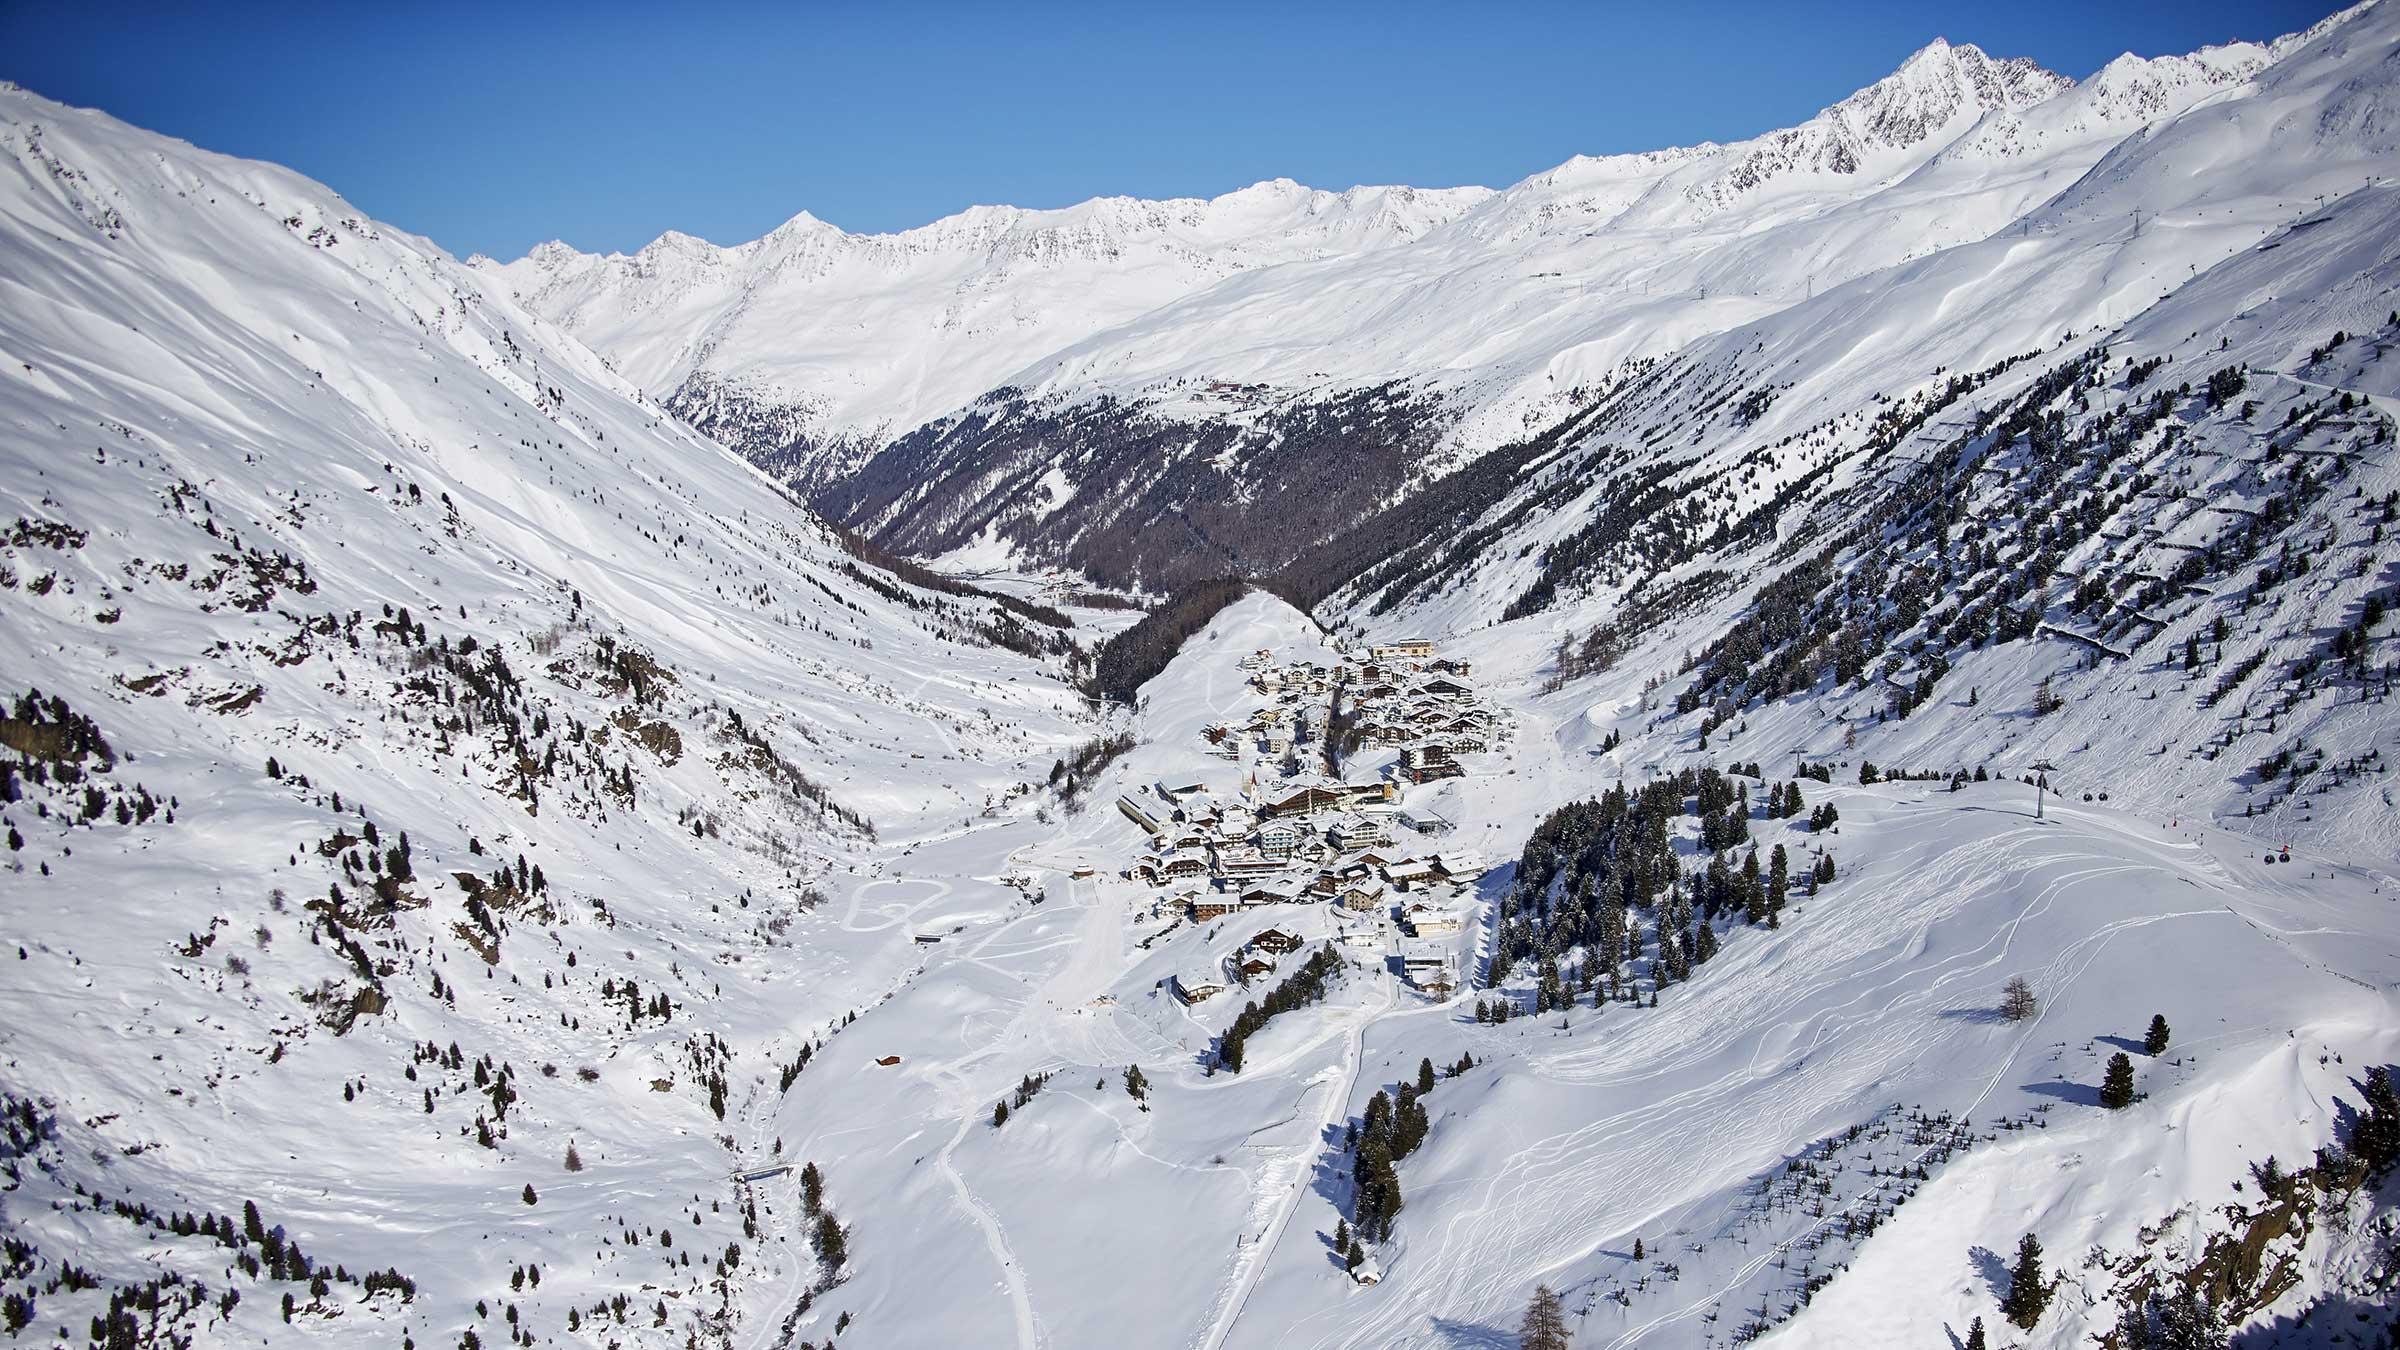 Langlaufen Obergurgl-Hochgurgl - Langlaufen